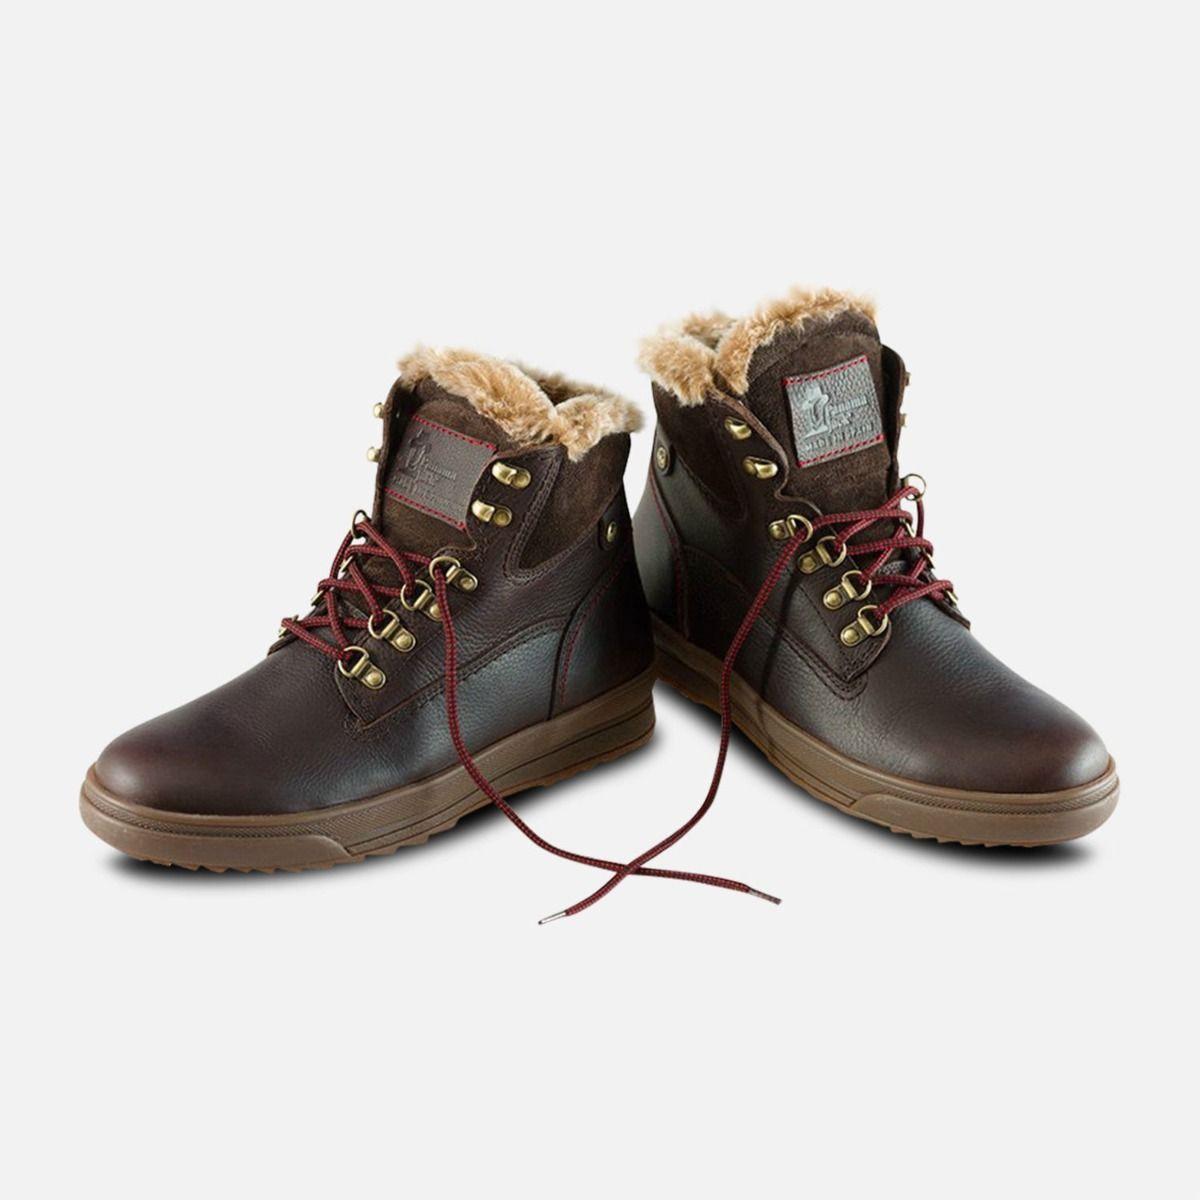 Fur Lined Brown Urban Trekker Panama Jack Boots